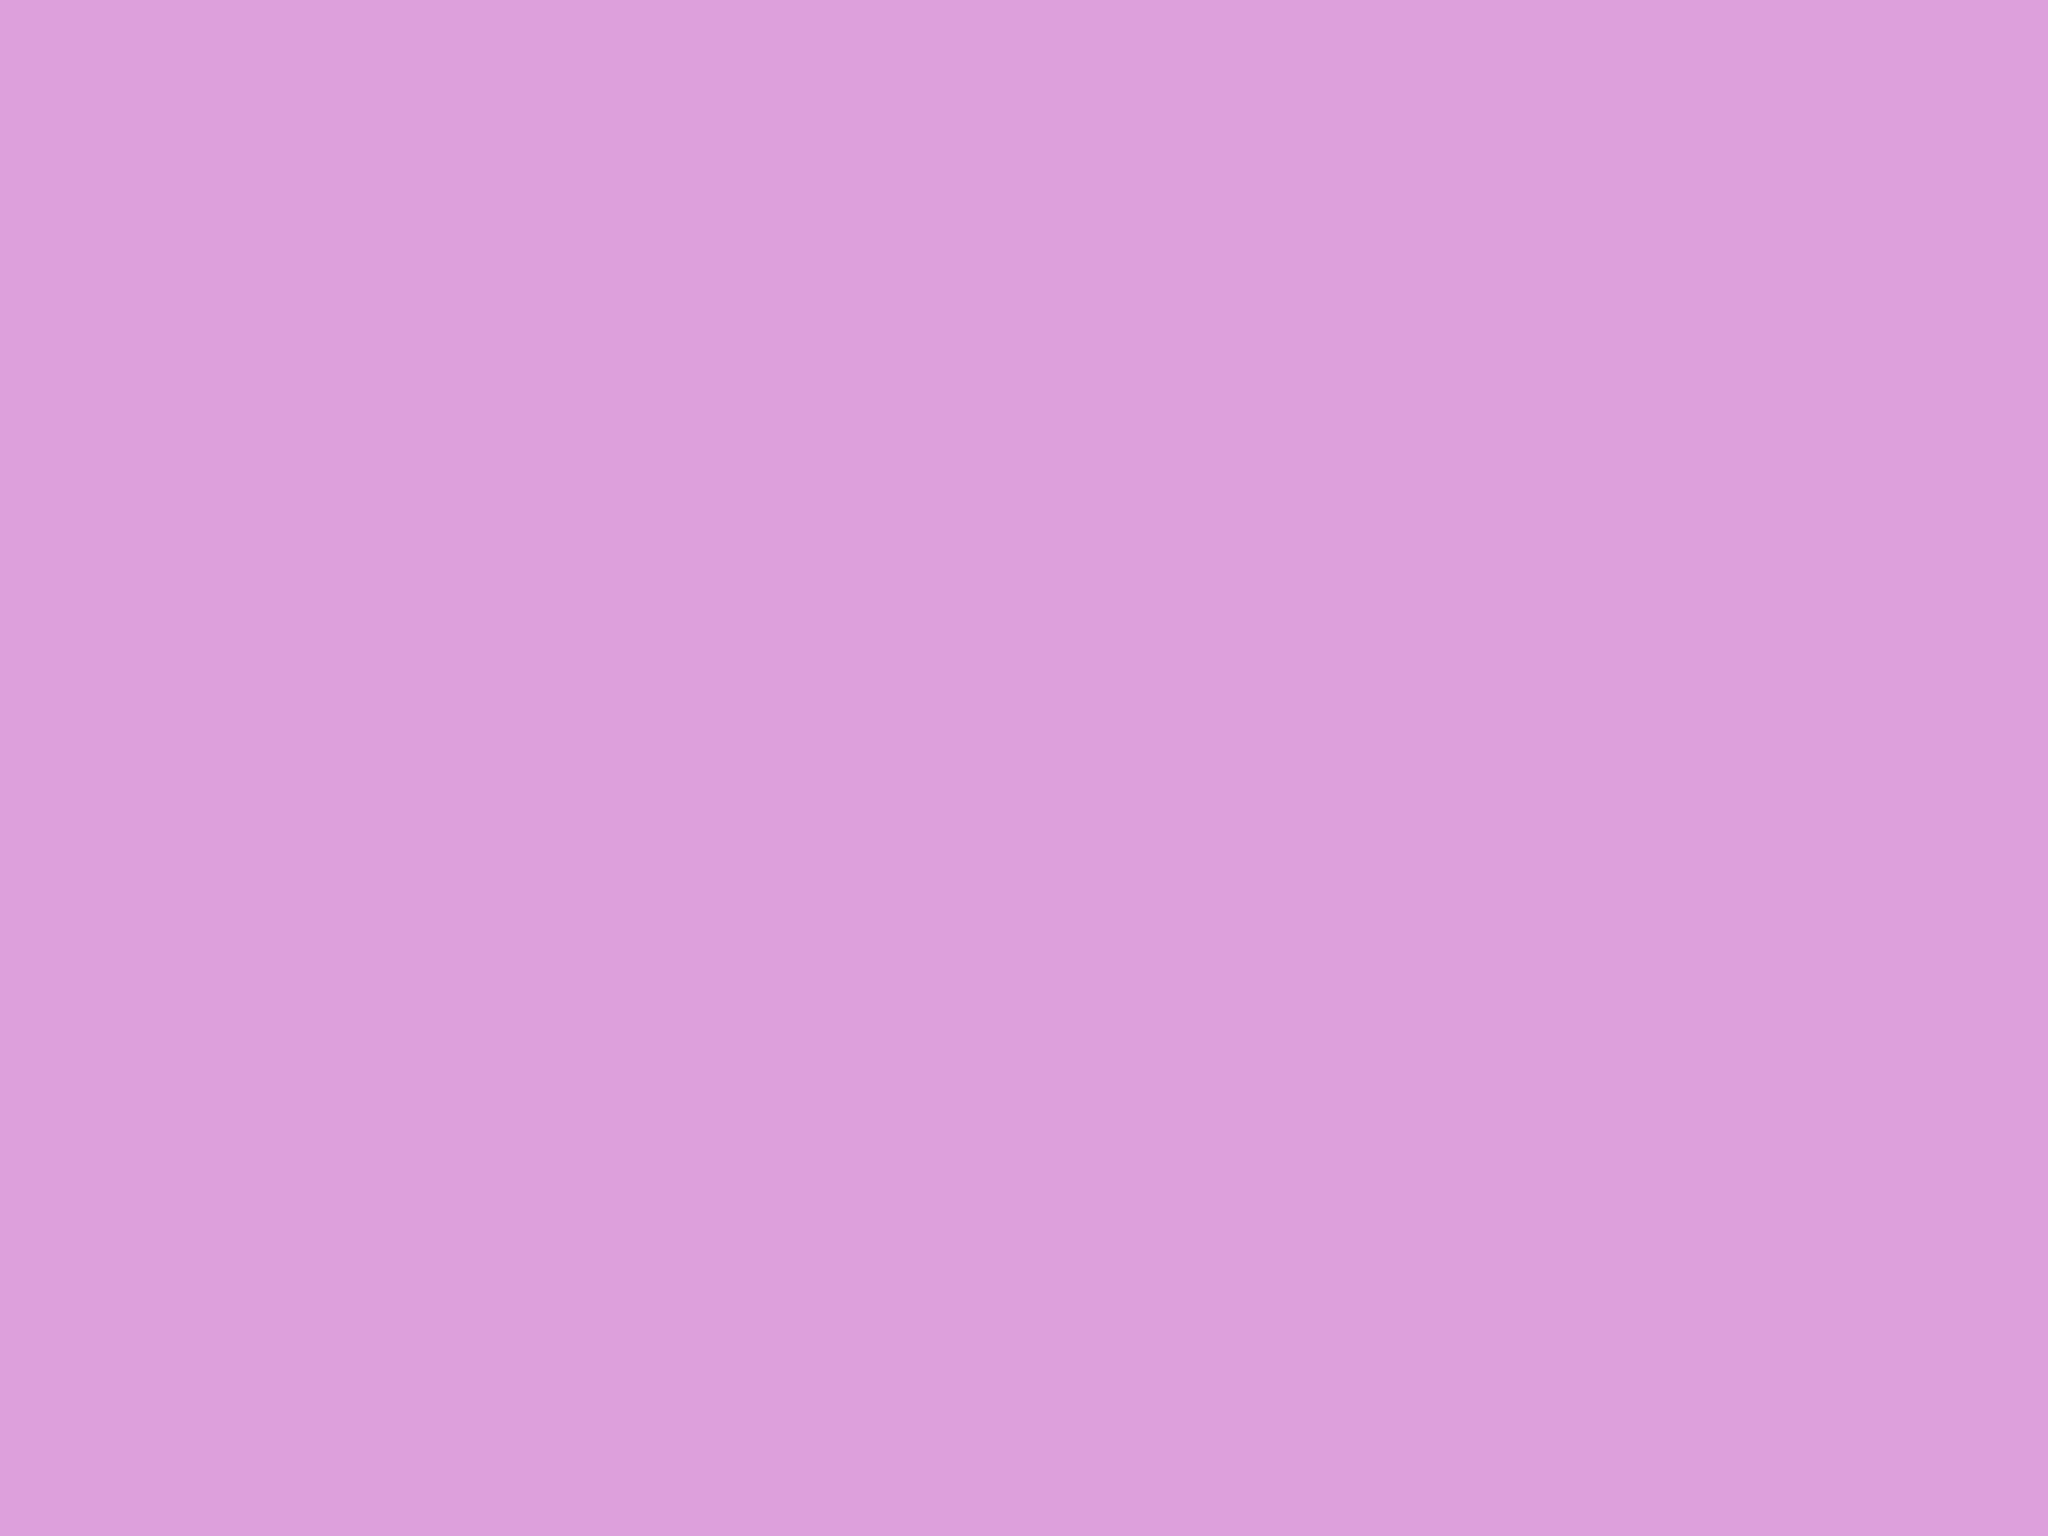 2048x1536 Pale Plum Solid Color Background